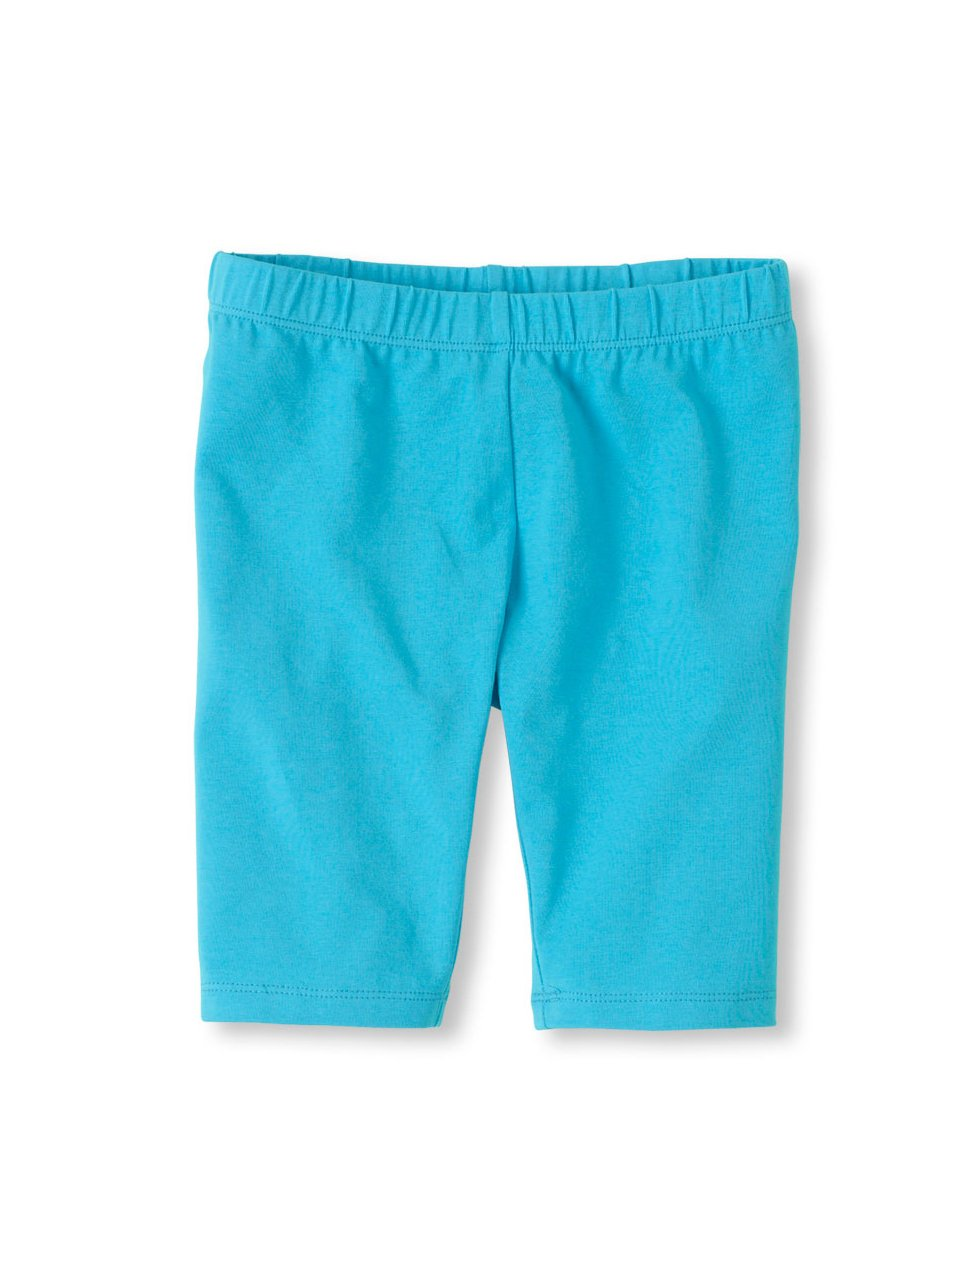 Vivian's Fashions Legging Shorts - Girls, Biker Length, Cotton (Turquoise, Lg)